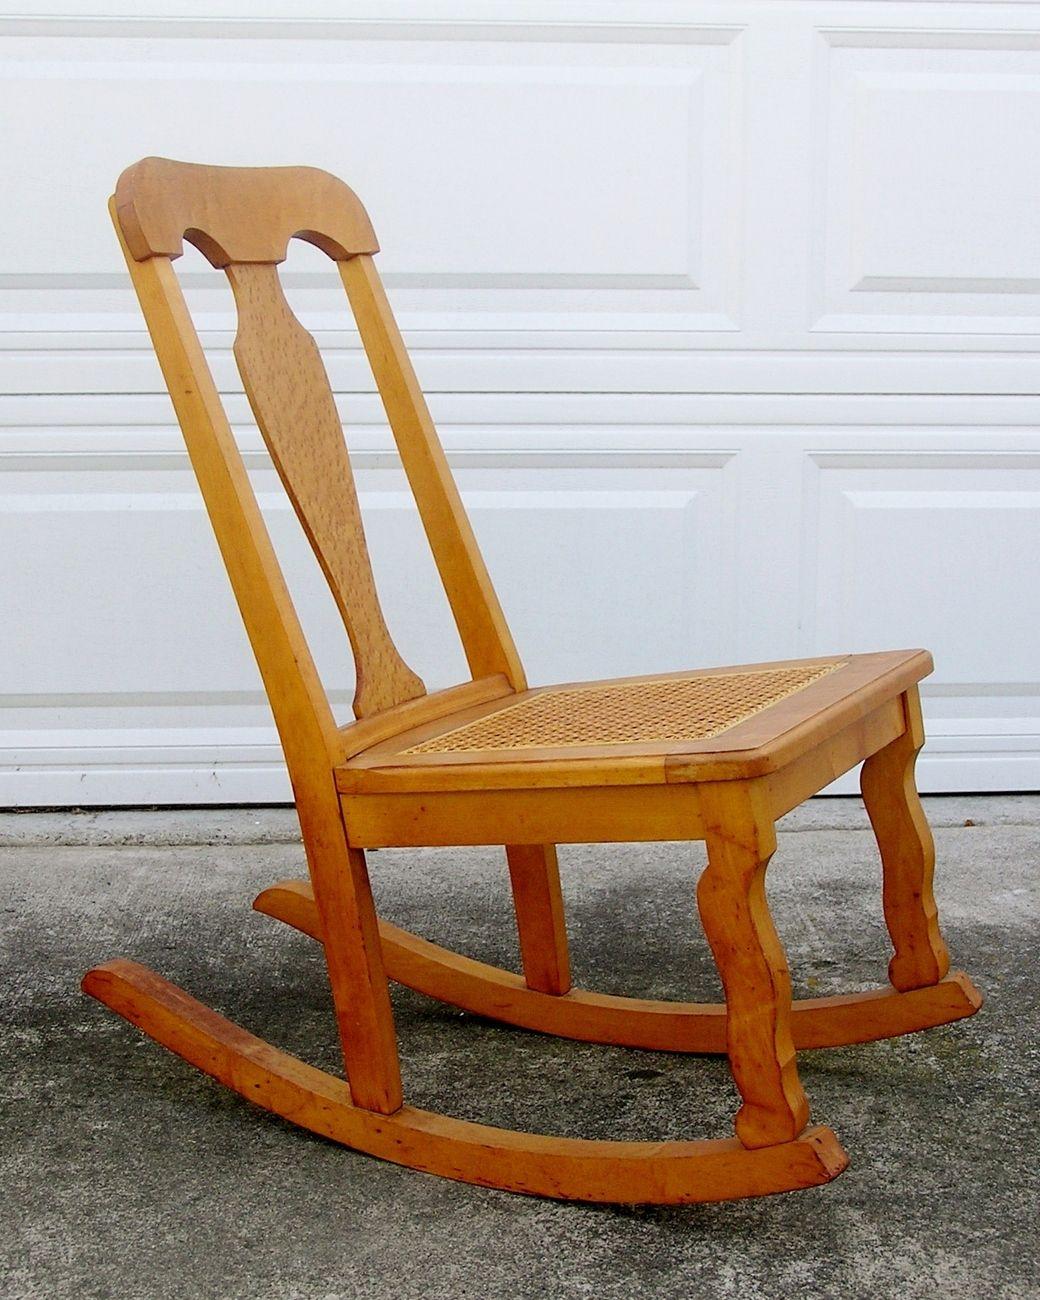 Old rocking chair   Vintage Birdseye Maple Rocker/Rocking Chair and 50  similar items . - Old Rocking Chair Vintage Birdseye Maple Rocker/Rocking Chair And